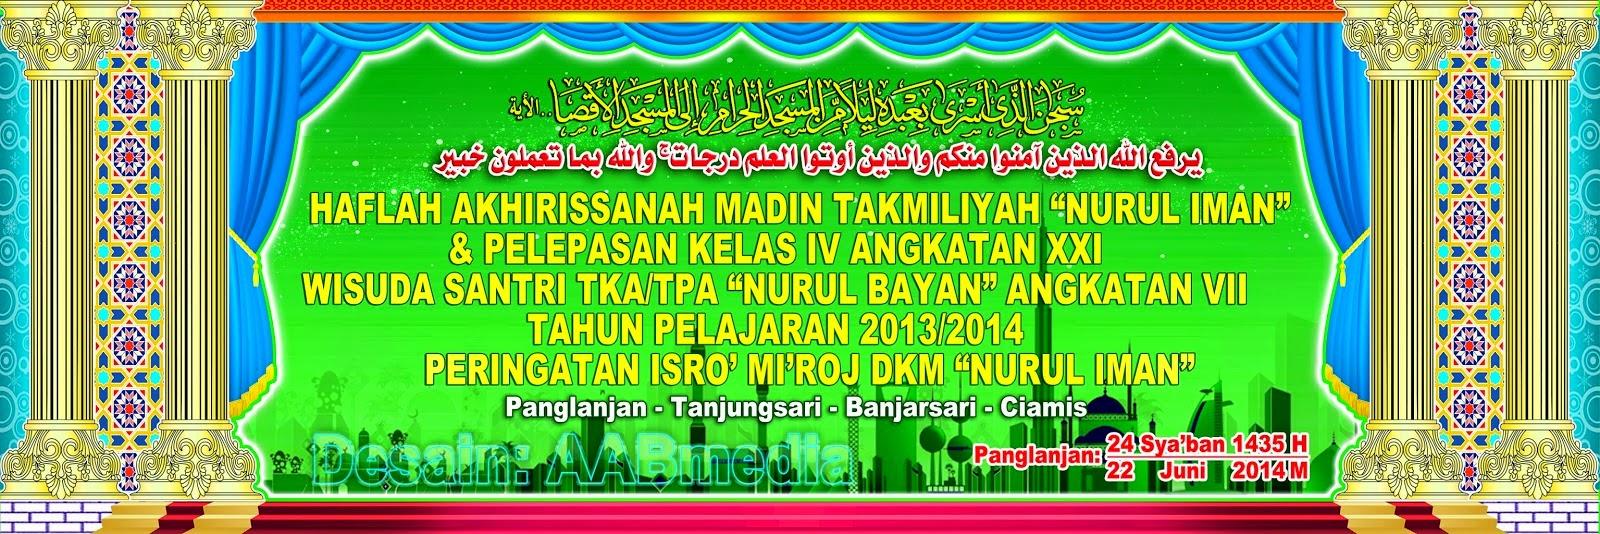 Background Banner Haflah cdr